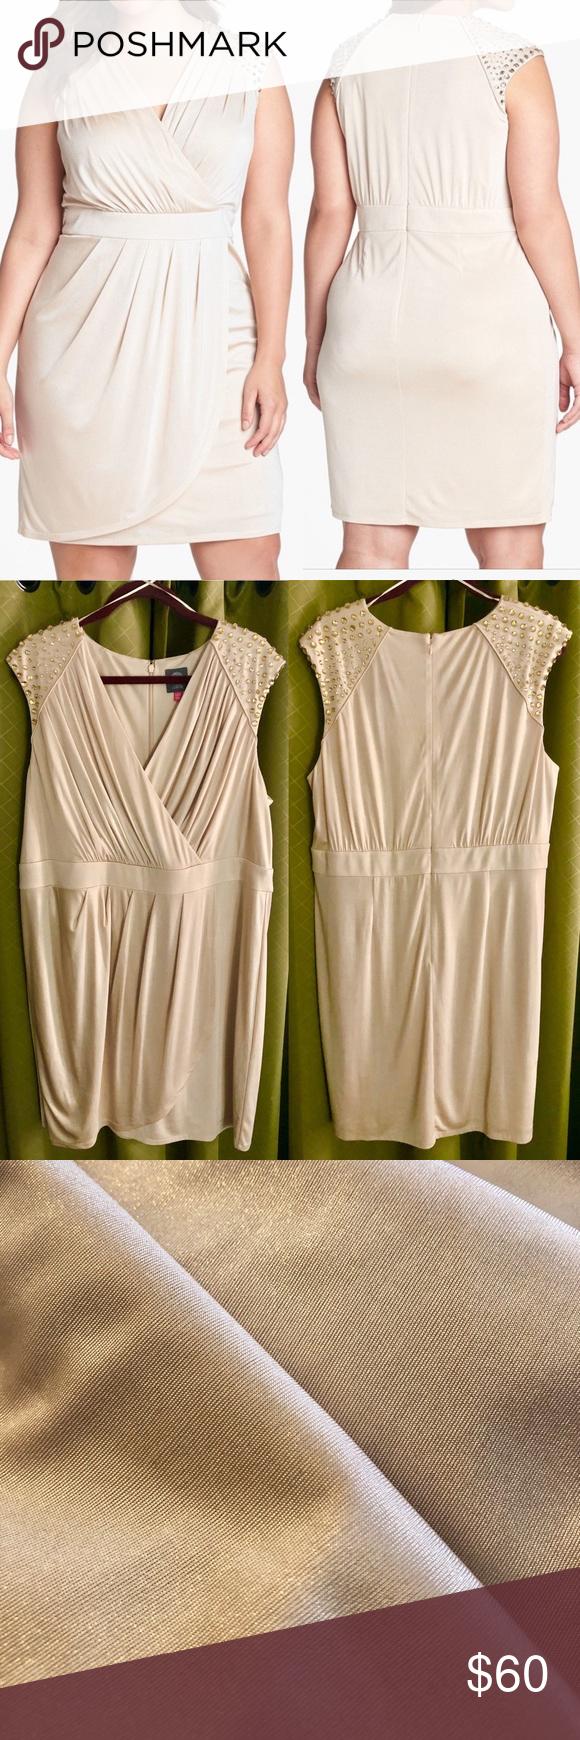 Vince Camuto Champagne Cocktail Dress 18w Plus Champagne Cocktail Dress Dresses Faux Wrap Dress [ 1740 x 580 Pixel ]